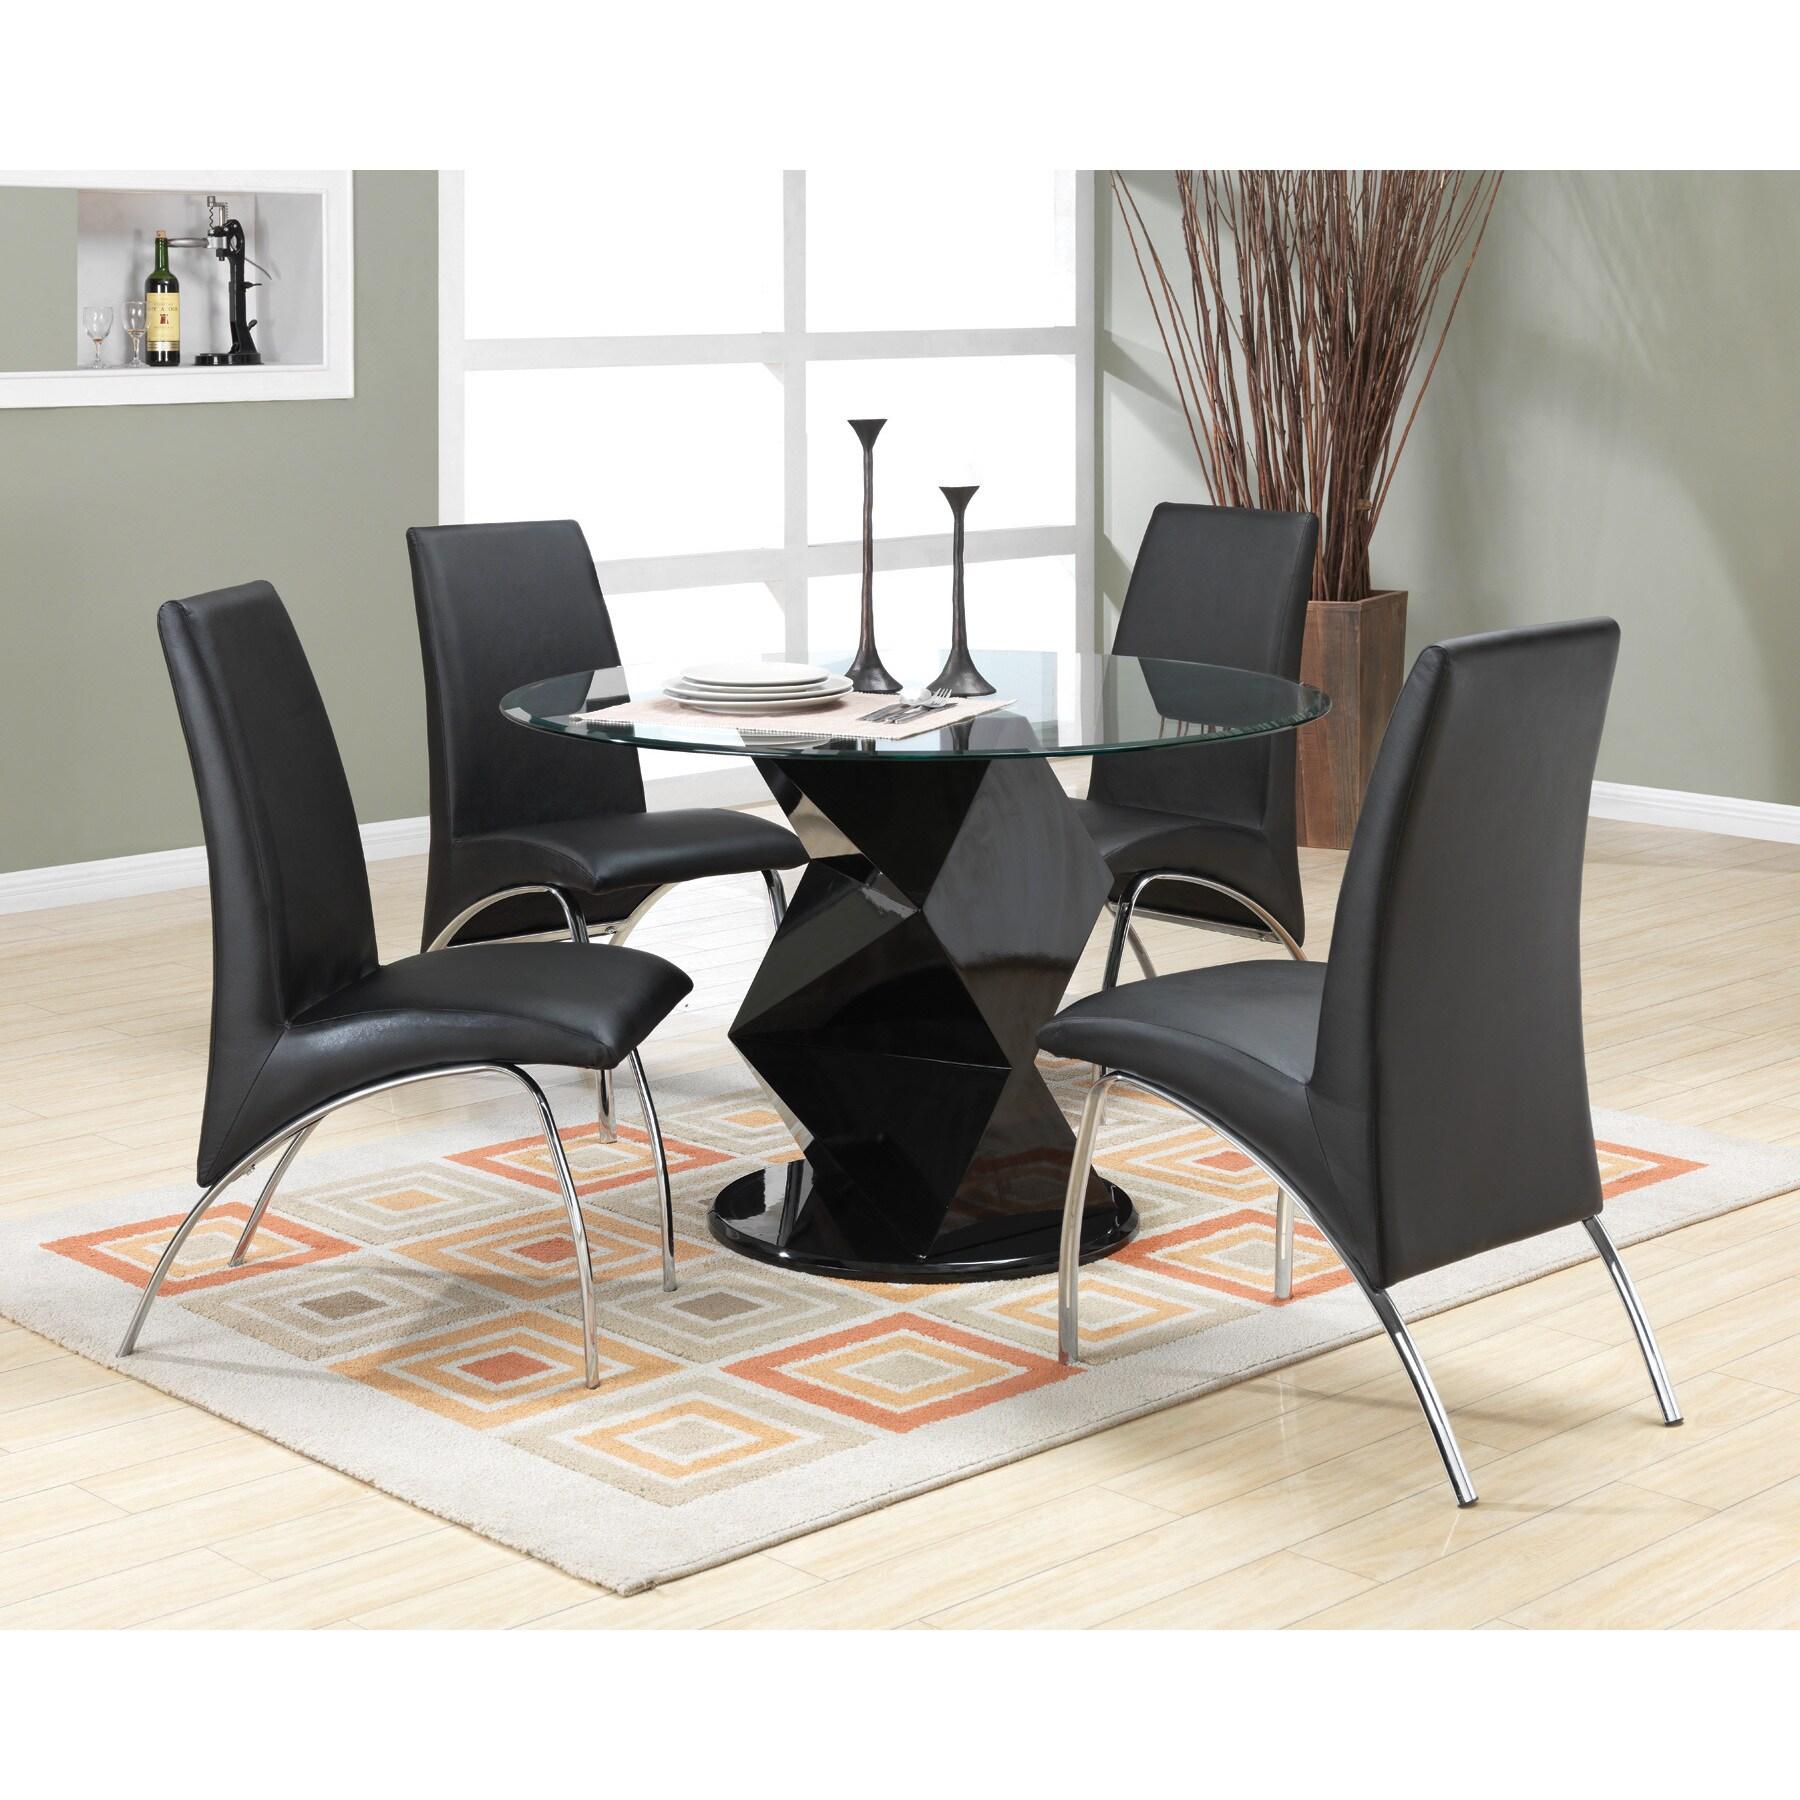 Coaster Furniture Glossy Black Pedestal Round Dining Tabl...